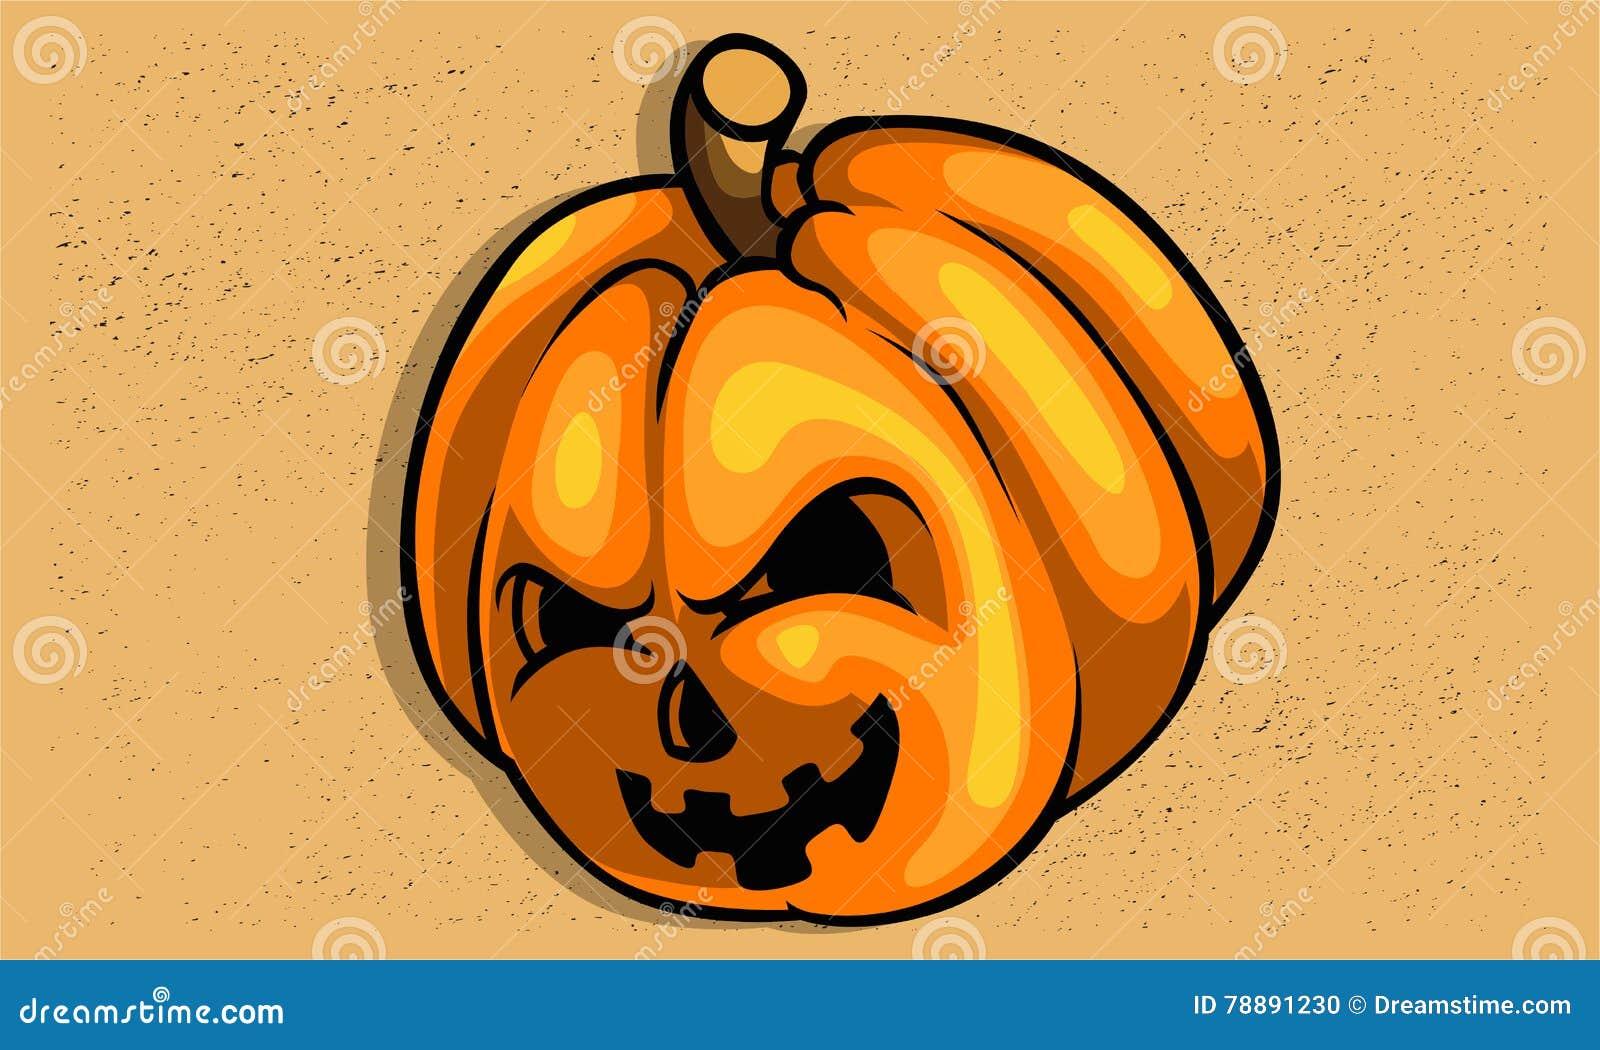 creepy scary pumpkin for halloween texture easy remove stock vector